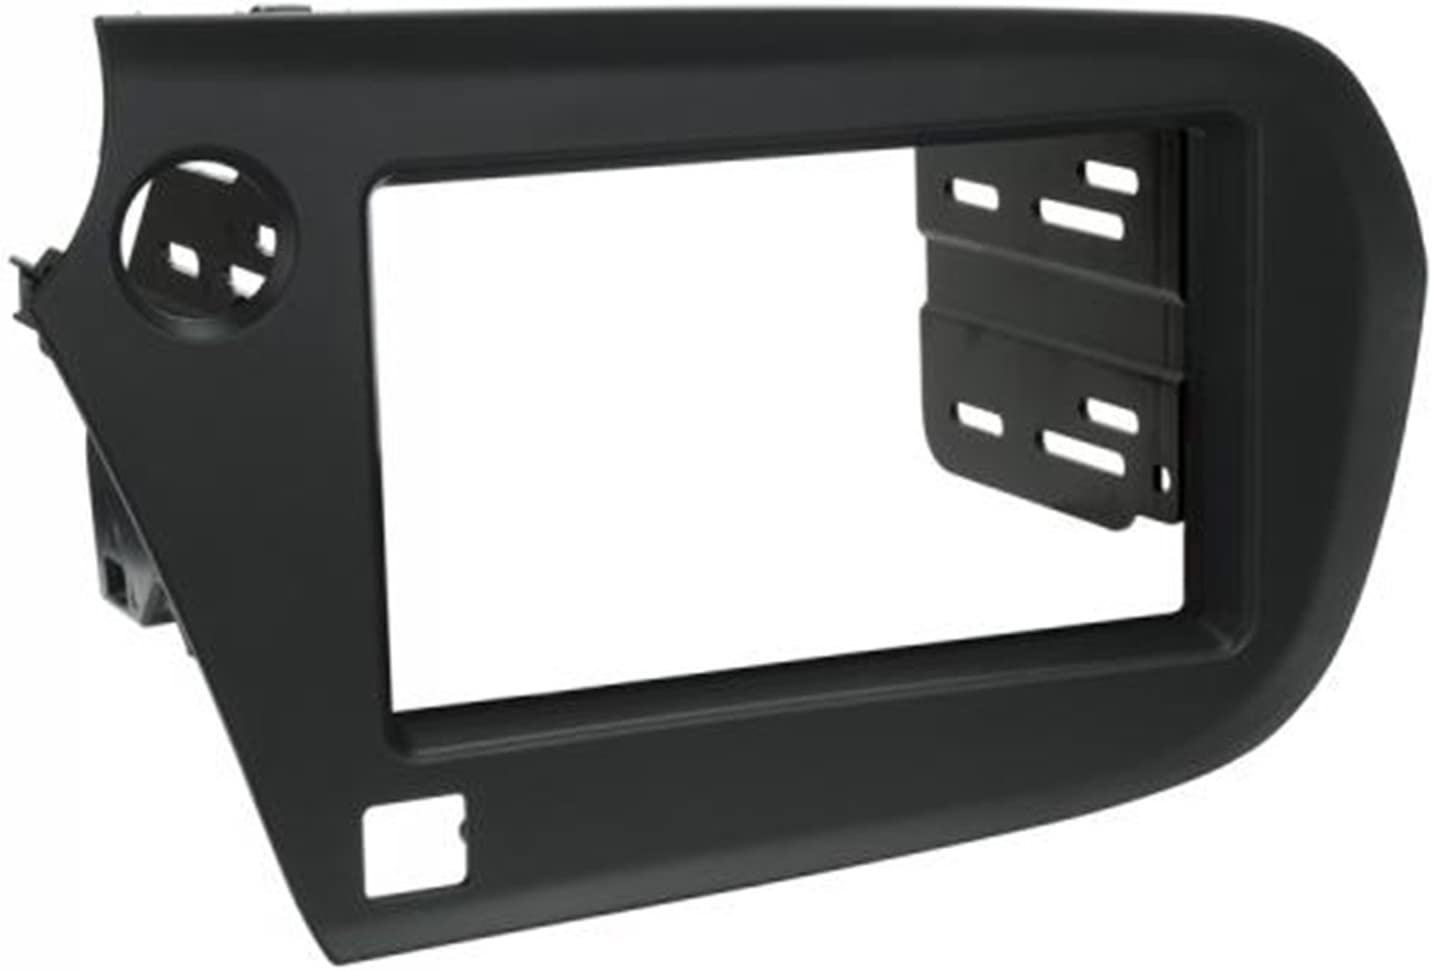 Metra 99-7878B Single or Double DIN Installation Dash Kit for 2010 Honda Insight